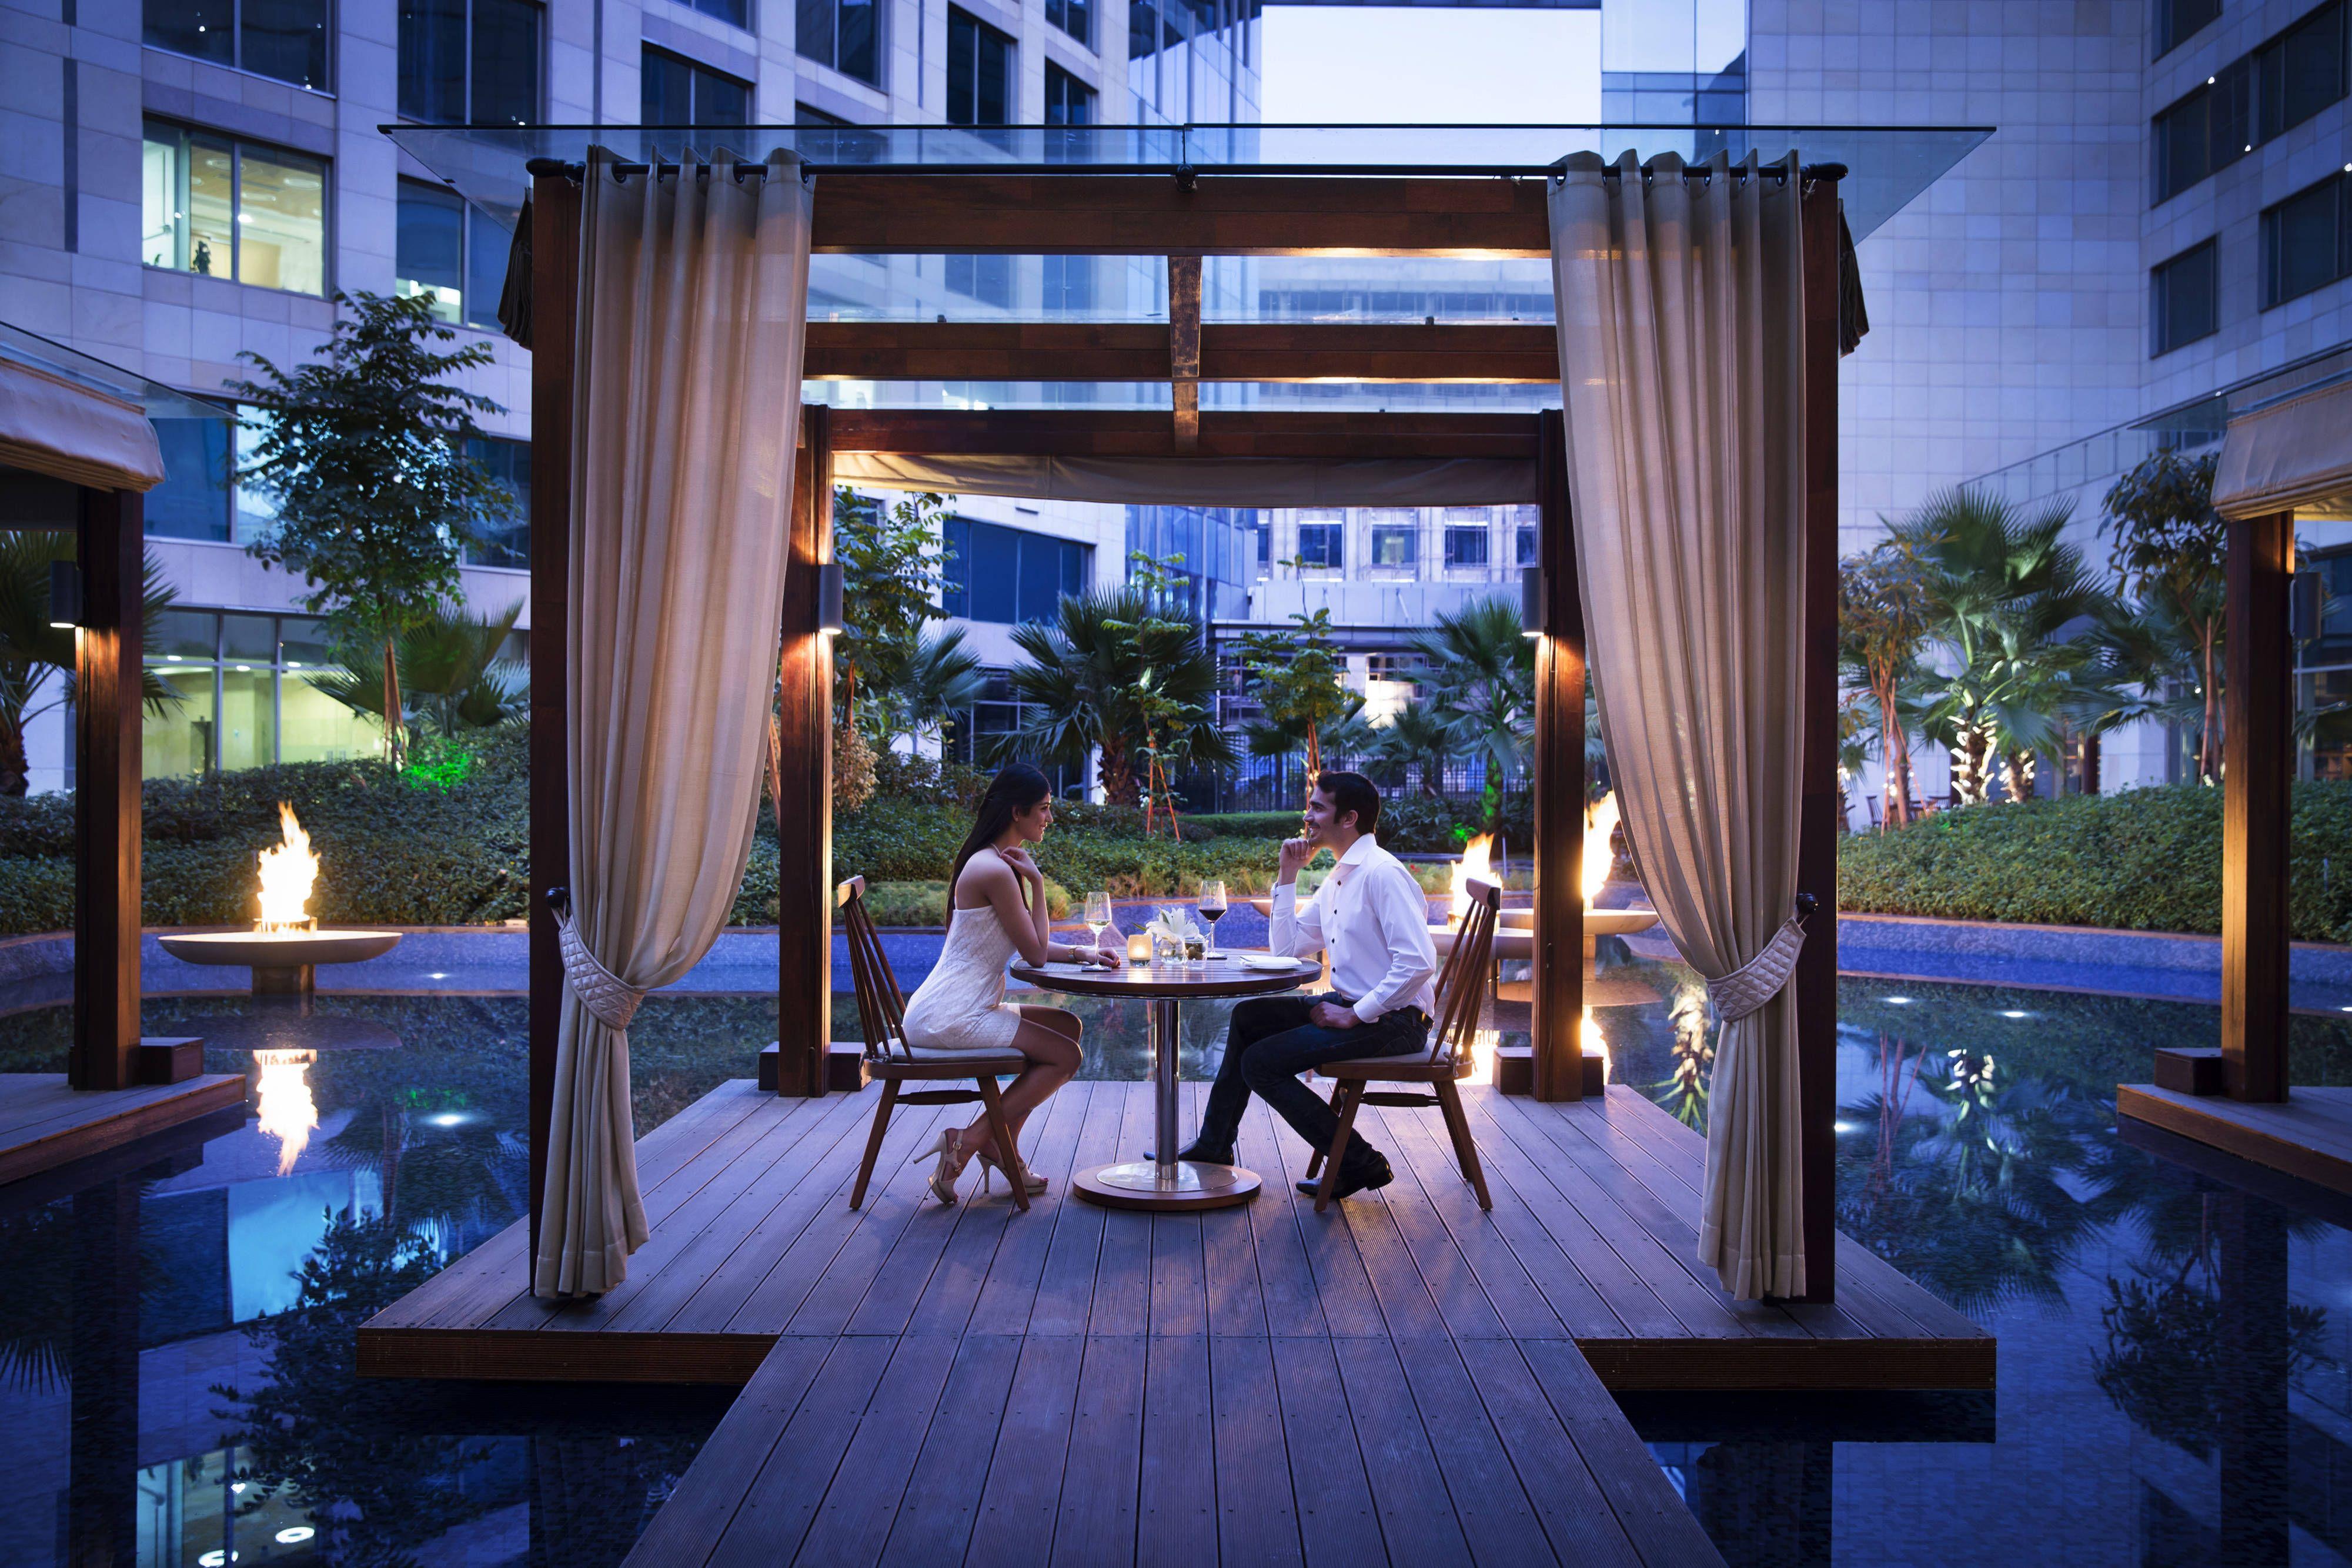 Jw Marriott Hotel New Delhi Aerocity Jw Lounge Outdoor Cabana Holiday Suite Visiting Romantic Restaurant Marriott Hotels Most Romantic